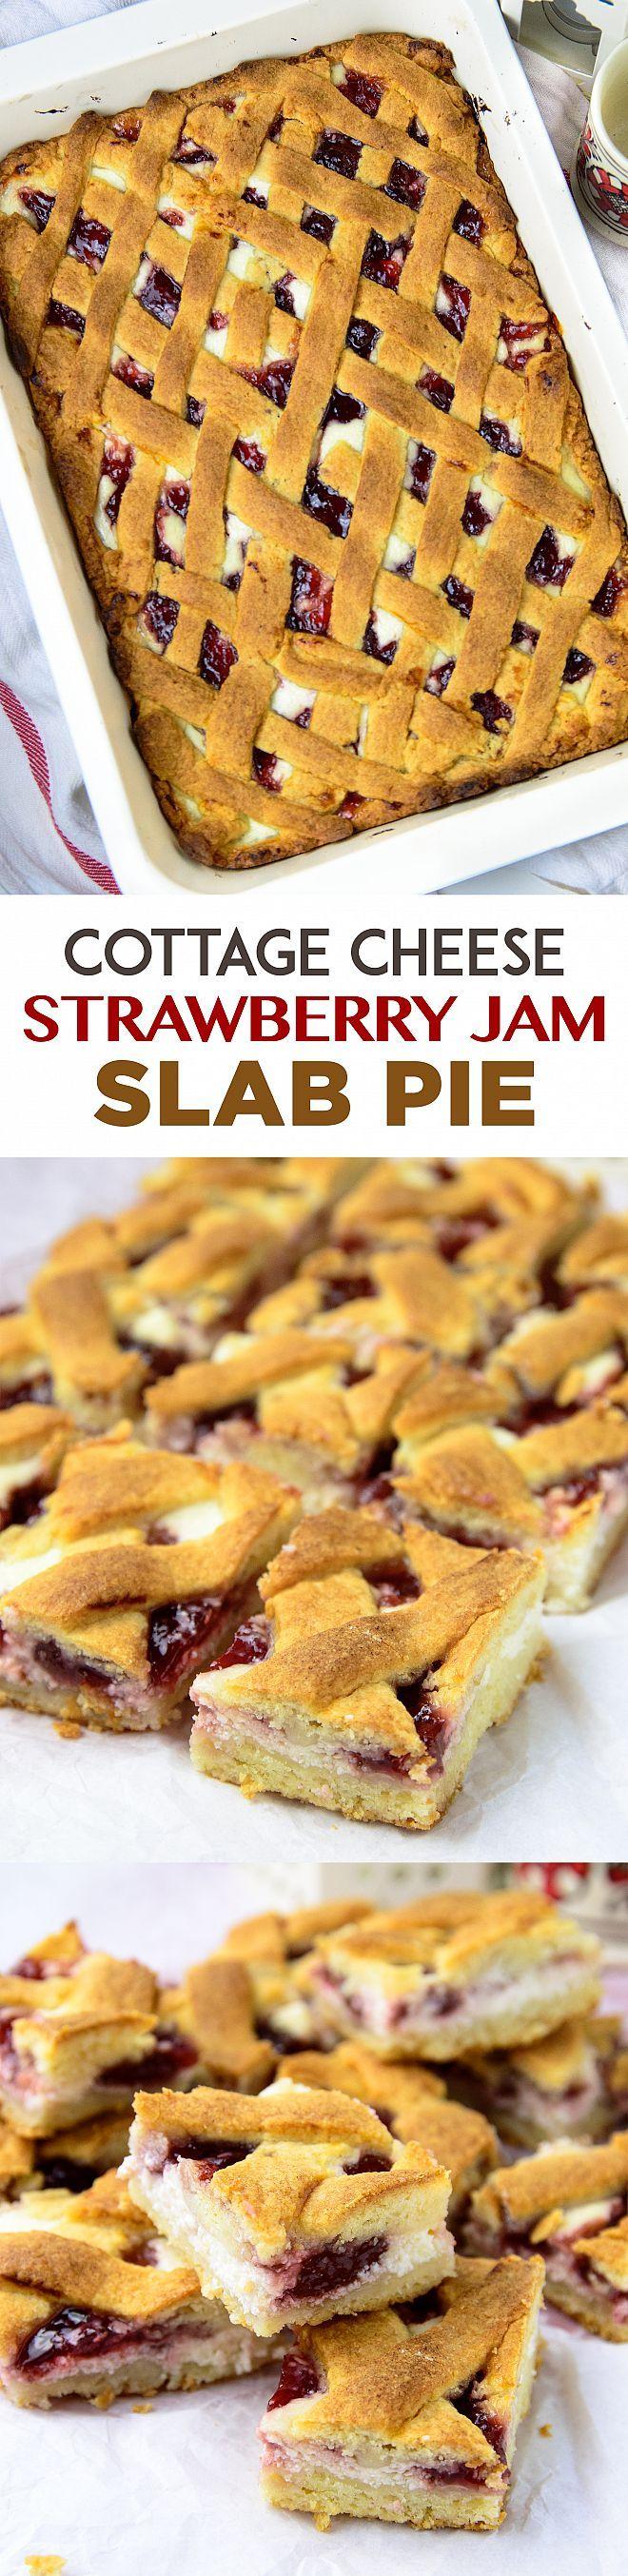 Cottage cheese strawberry slab pie | myzucchinirecipes.com